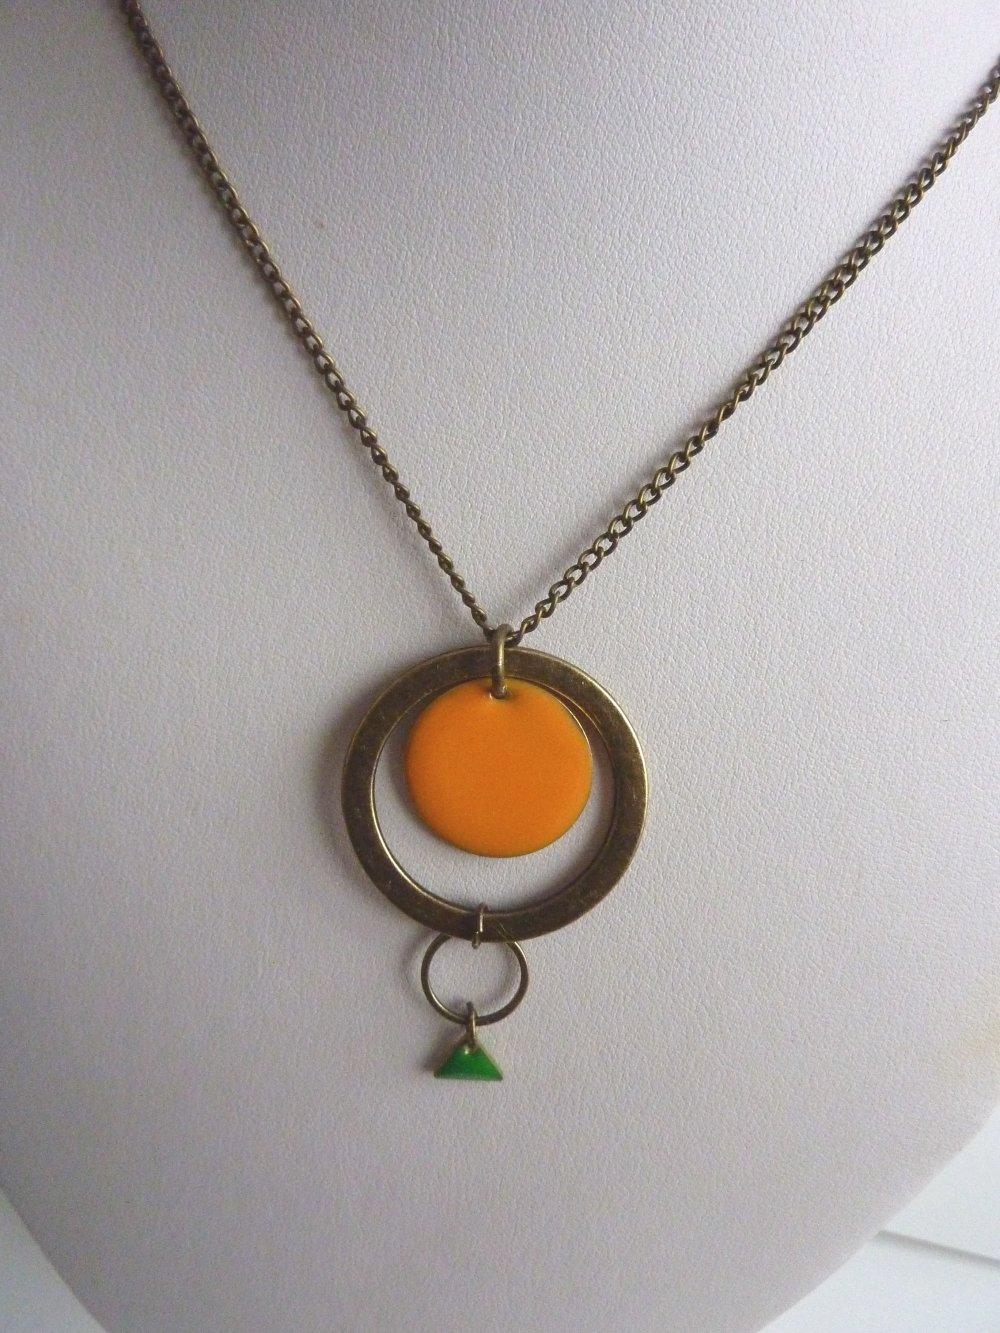 collier mi long graphique bronze, orange et vert